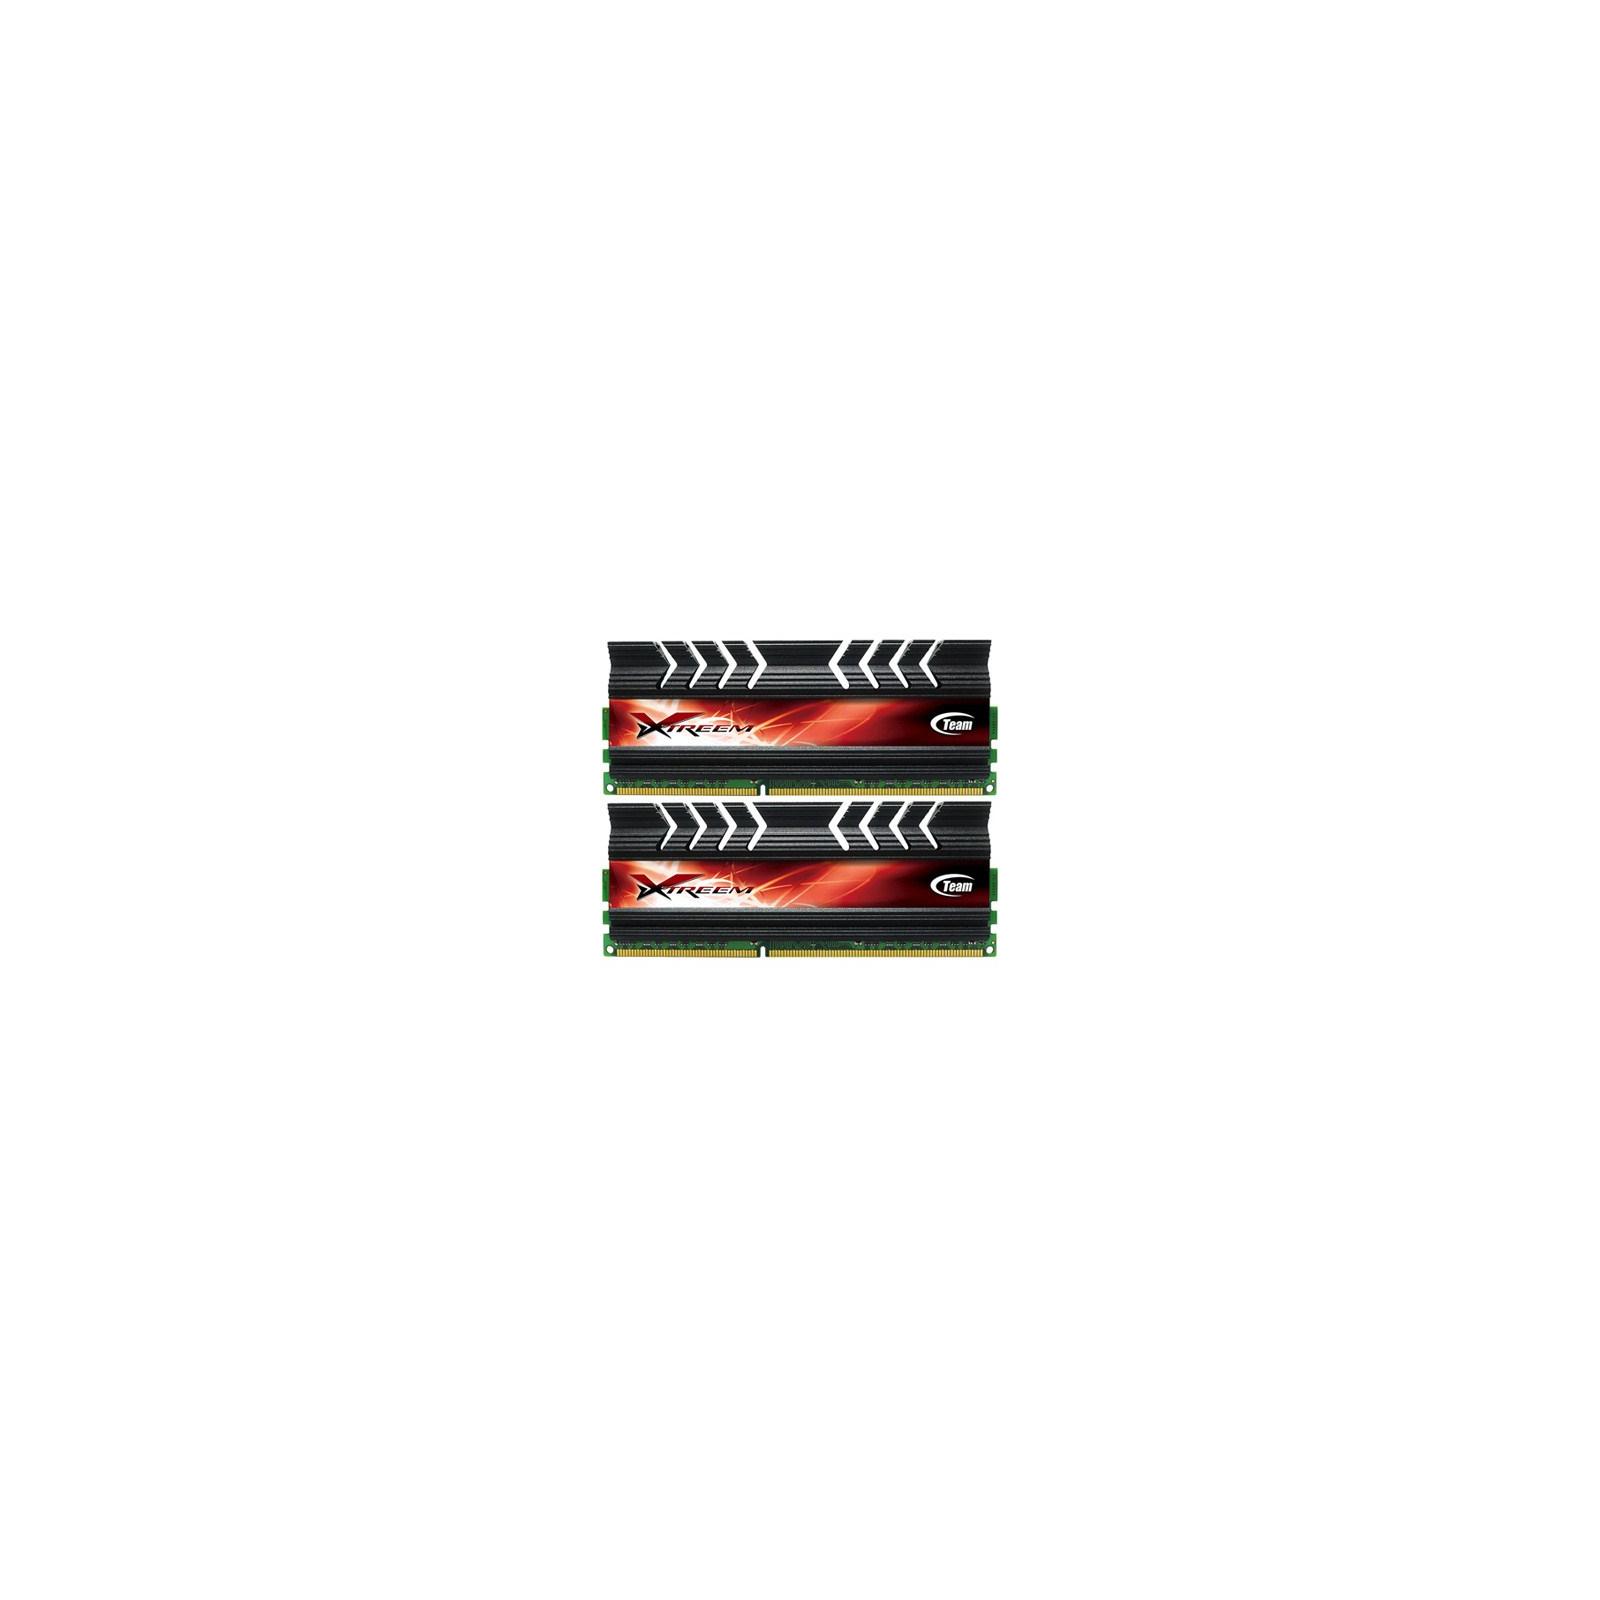 Модуль памяти для компьютера DDR3 4GB (2x2GB) 2000 MHz Team (TXD34G2000HC9KDC01)